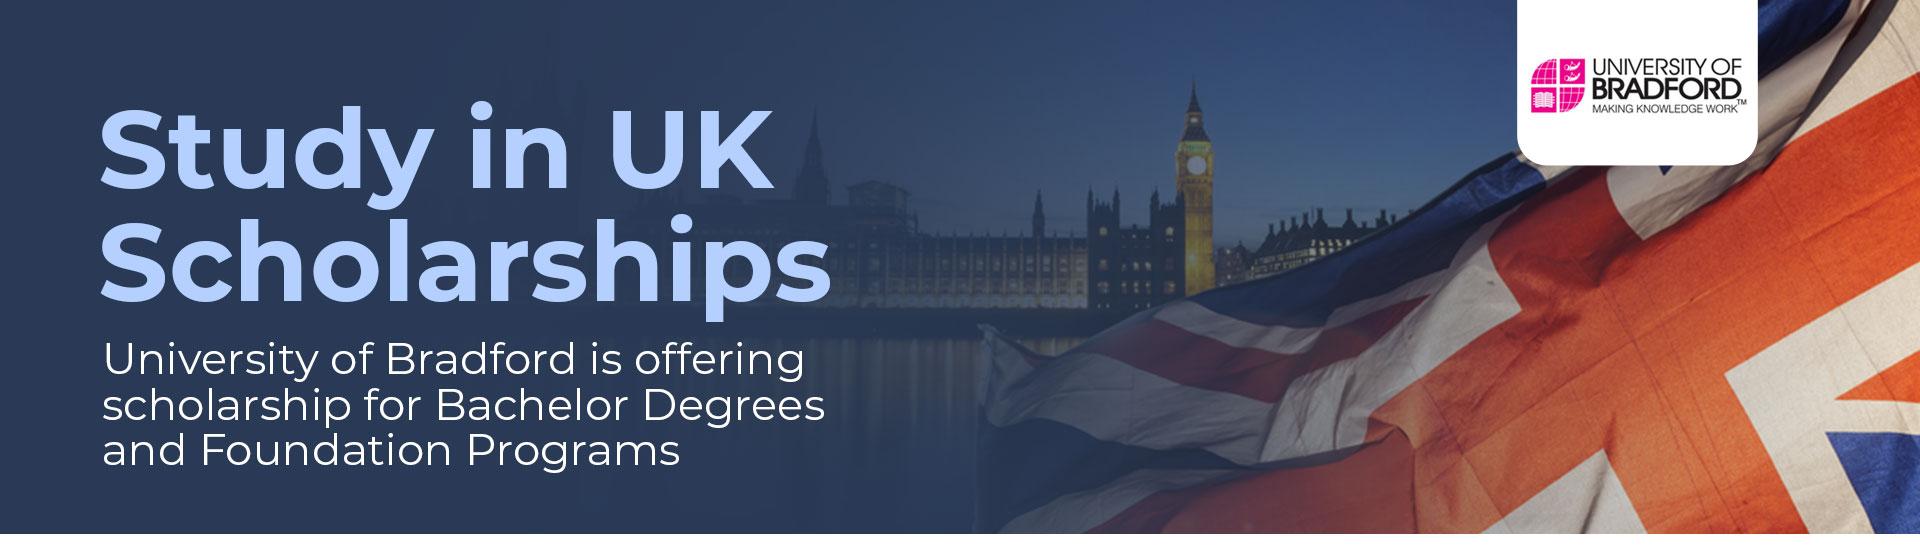 Study in UK Scholarships